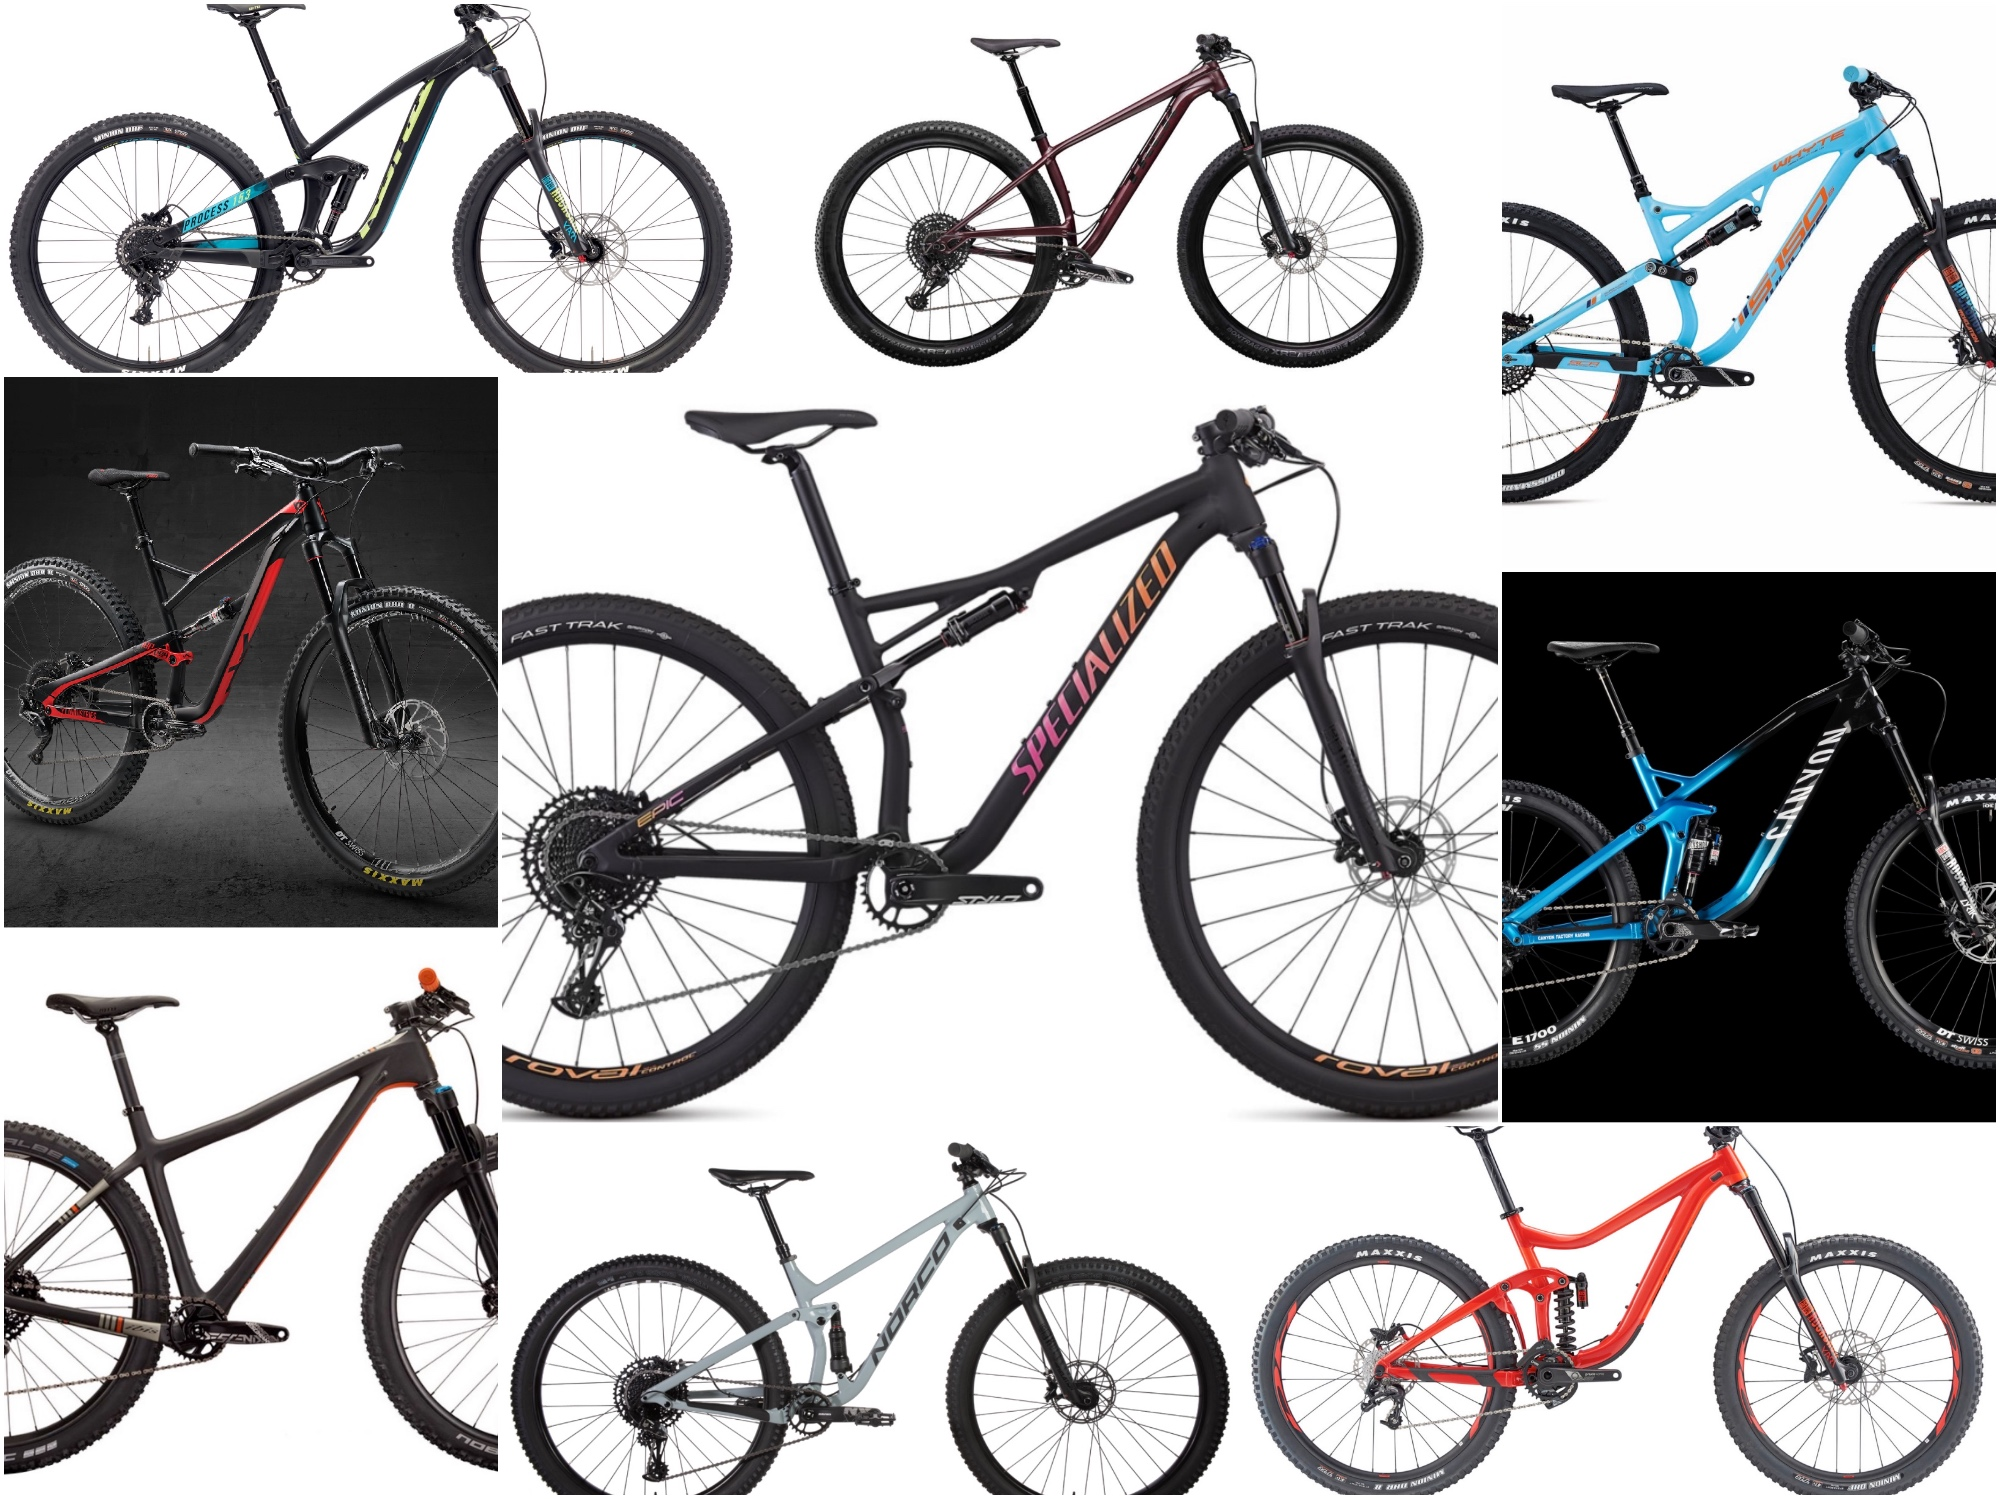 bdd0c816fc9 Best Mountain Bikes Under $3000- Mtbr.com